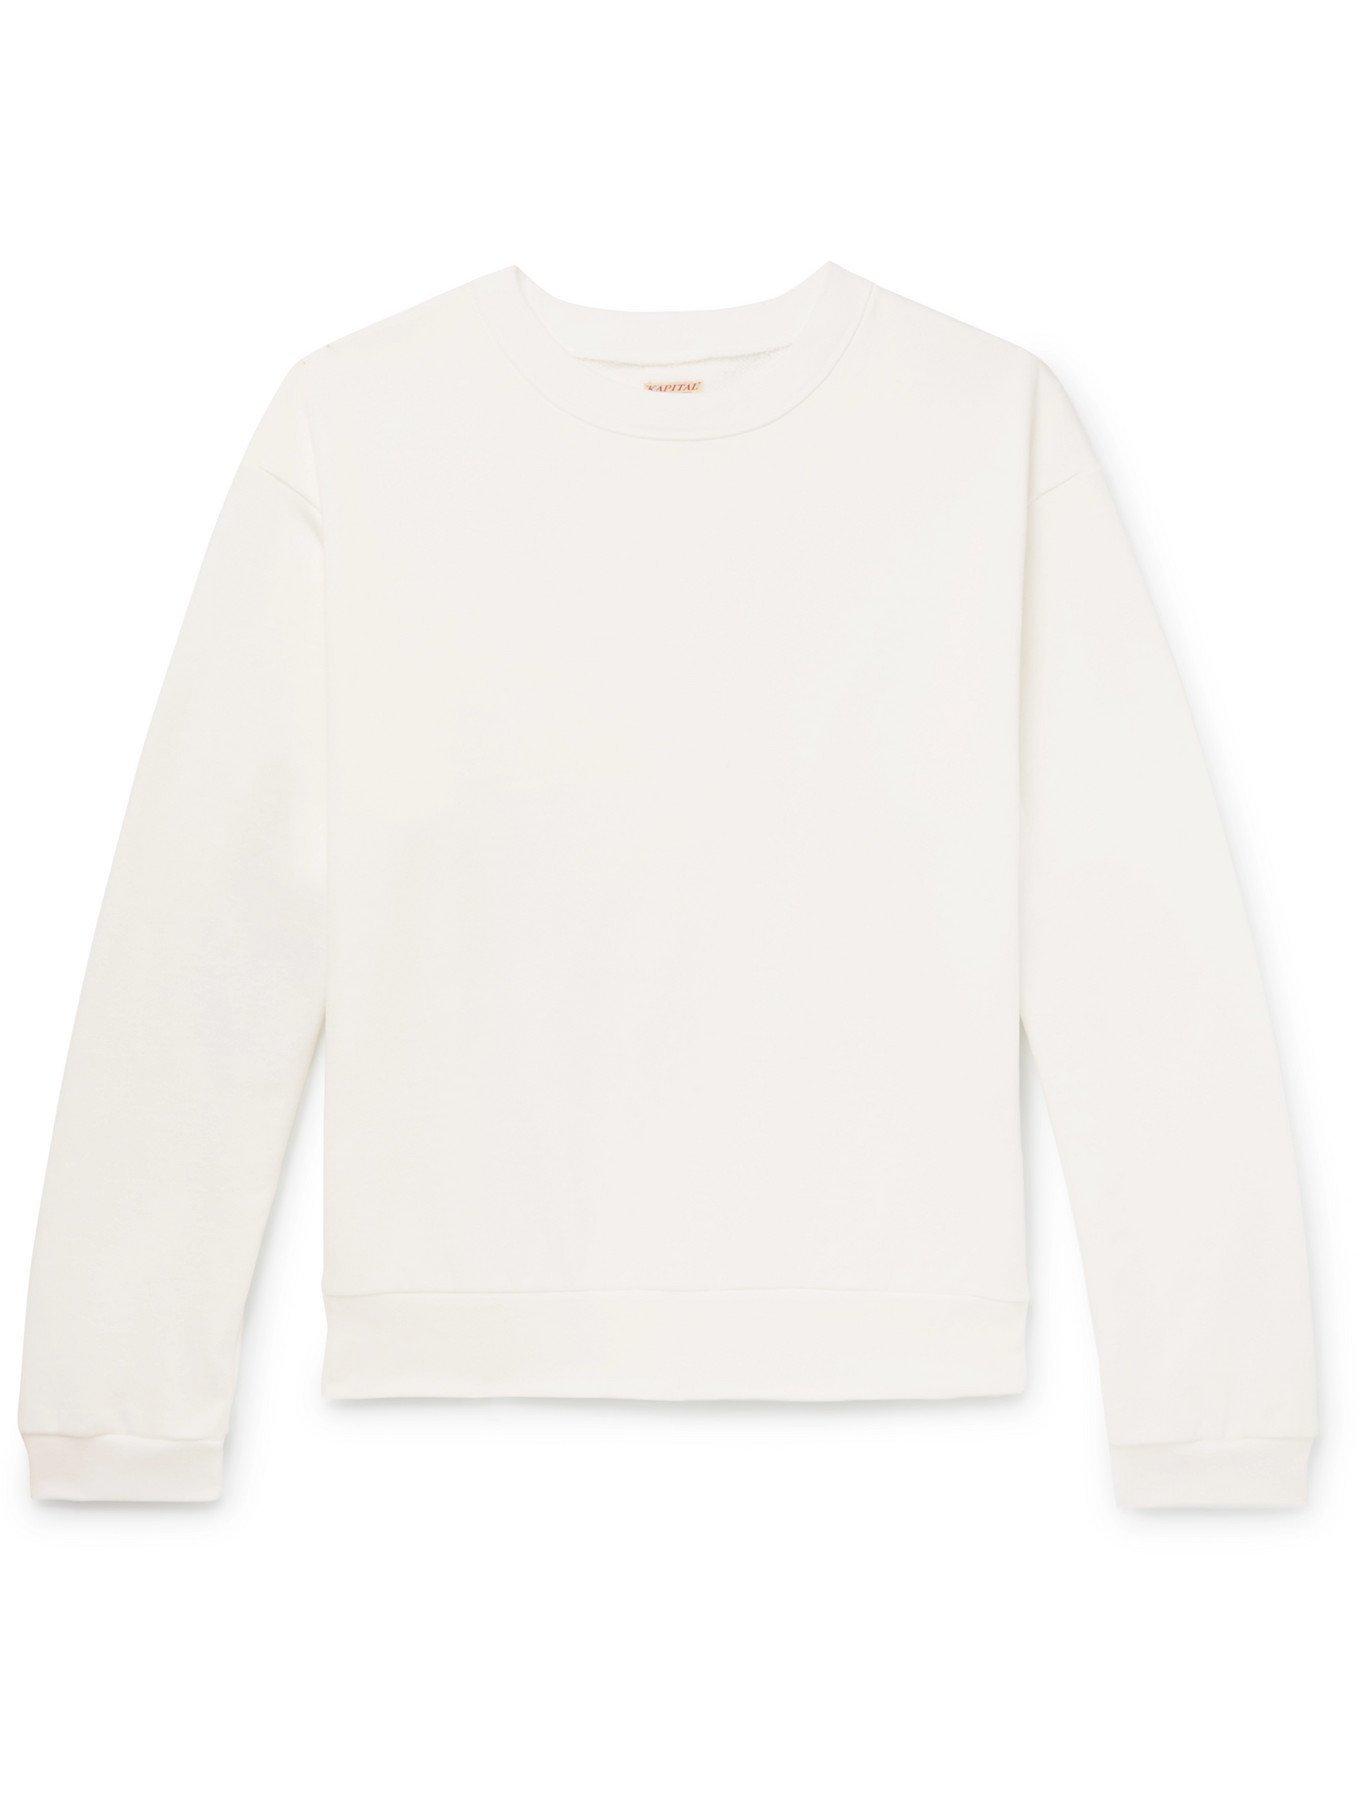 Photo: KAPITAL - Printed Loopback Cotton-Jersey Sweatshirt - White